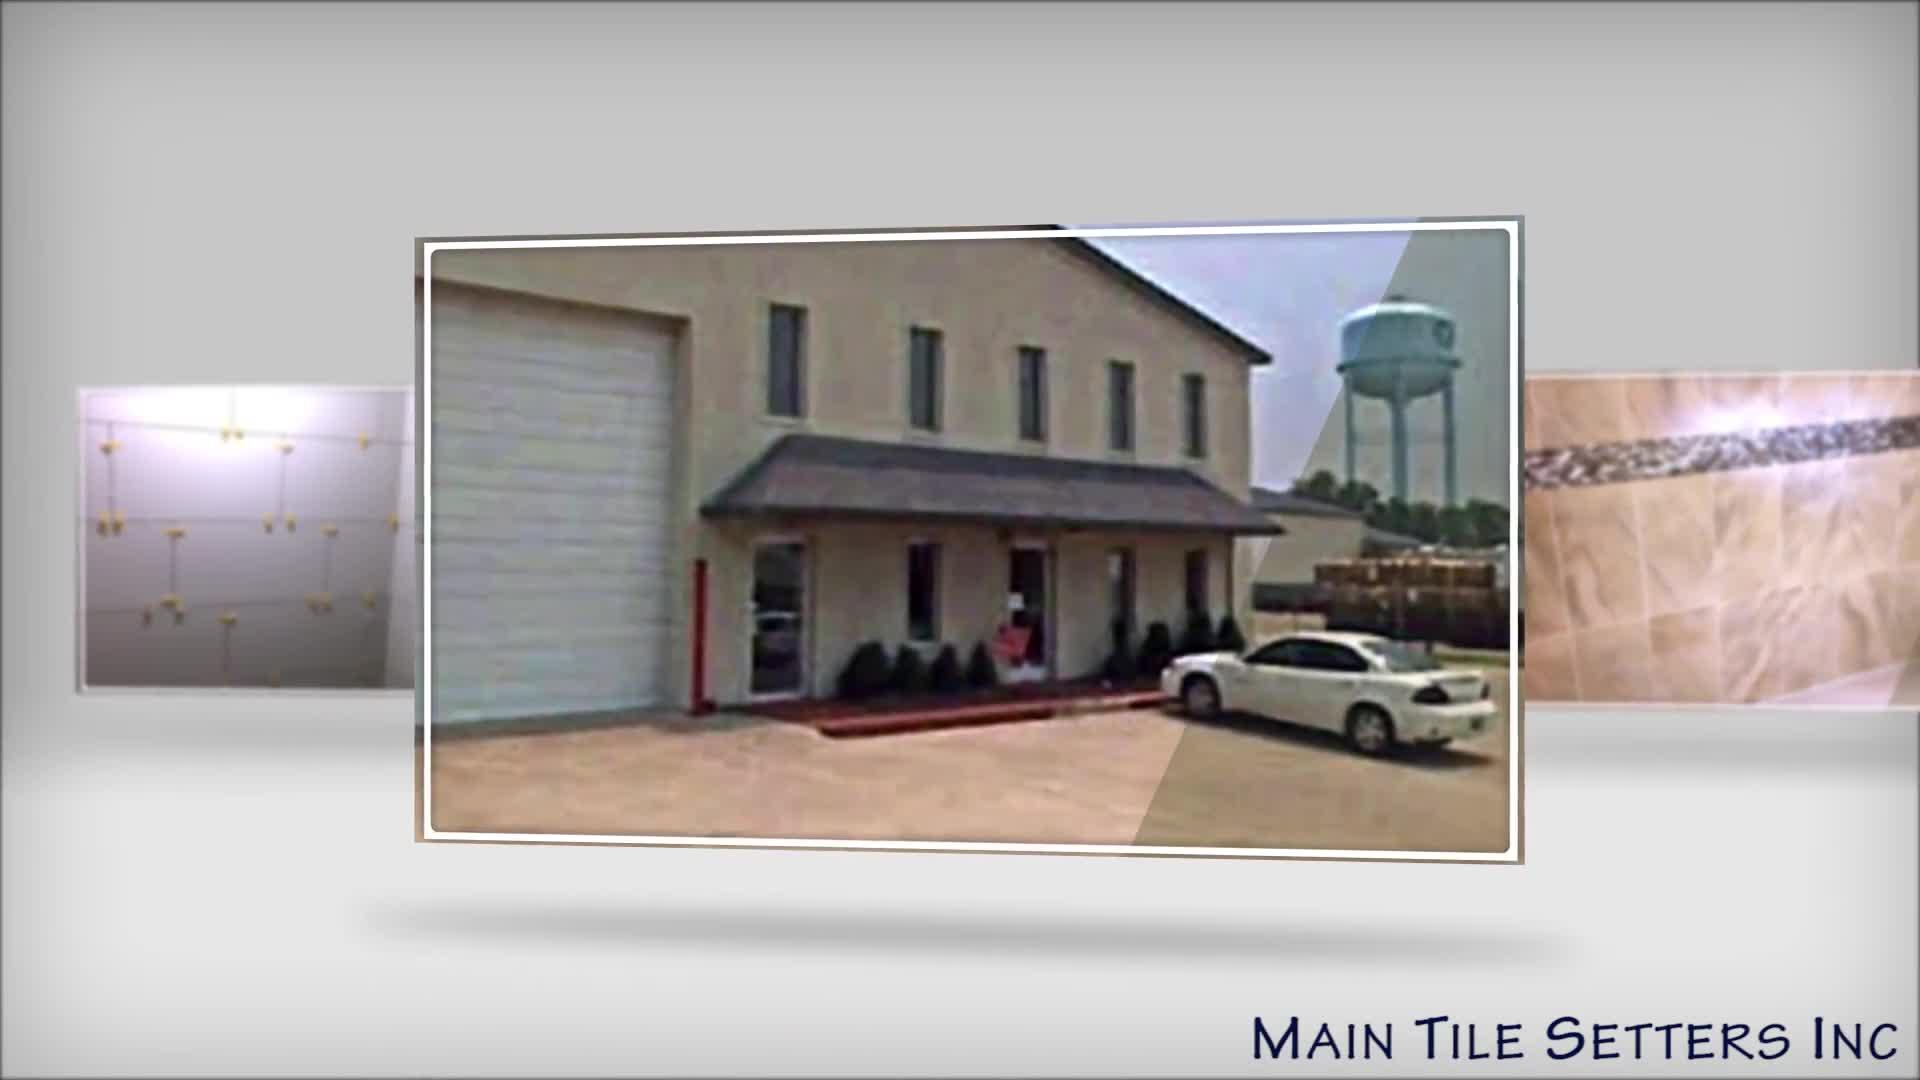 Main Tile Setters Inc